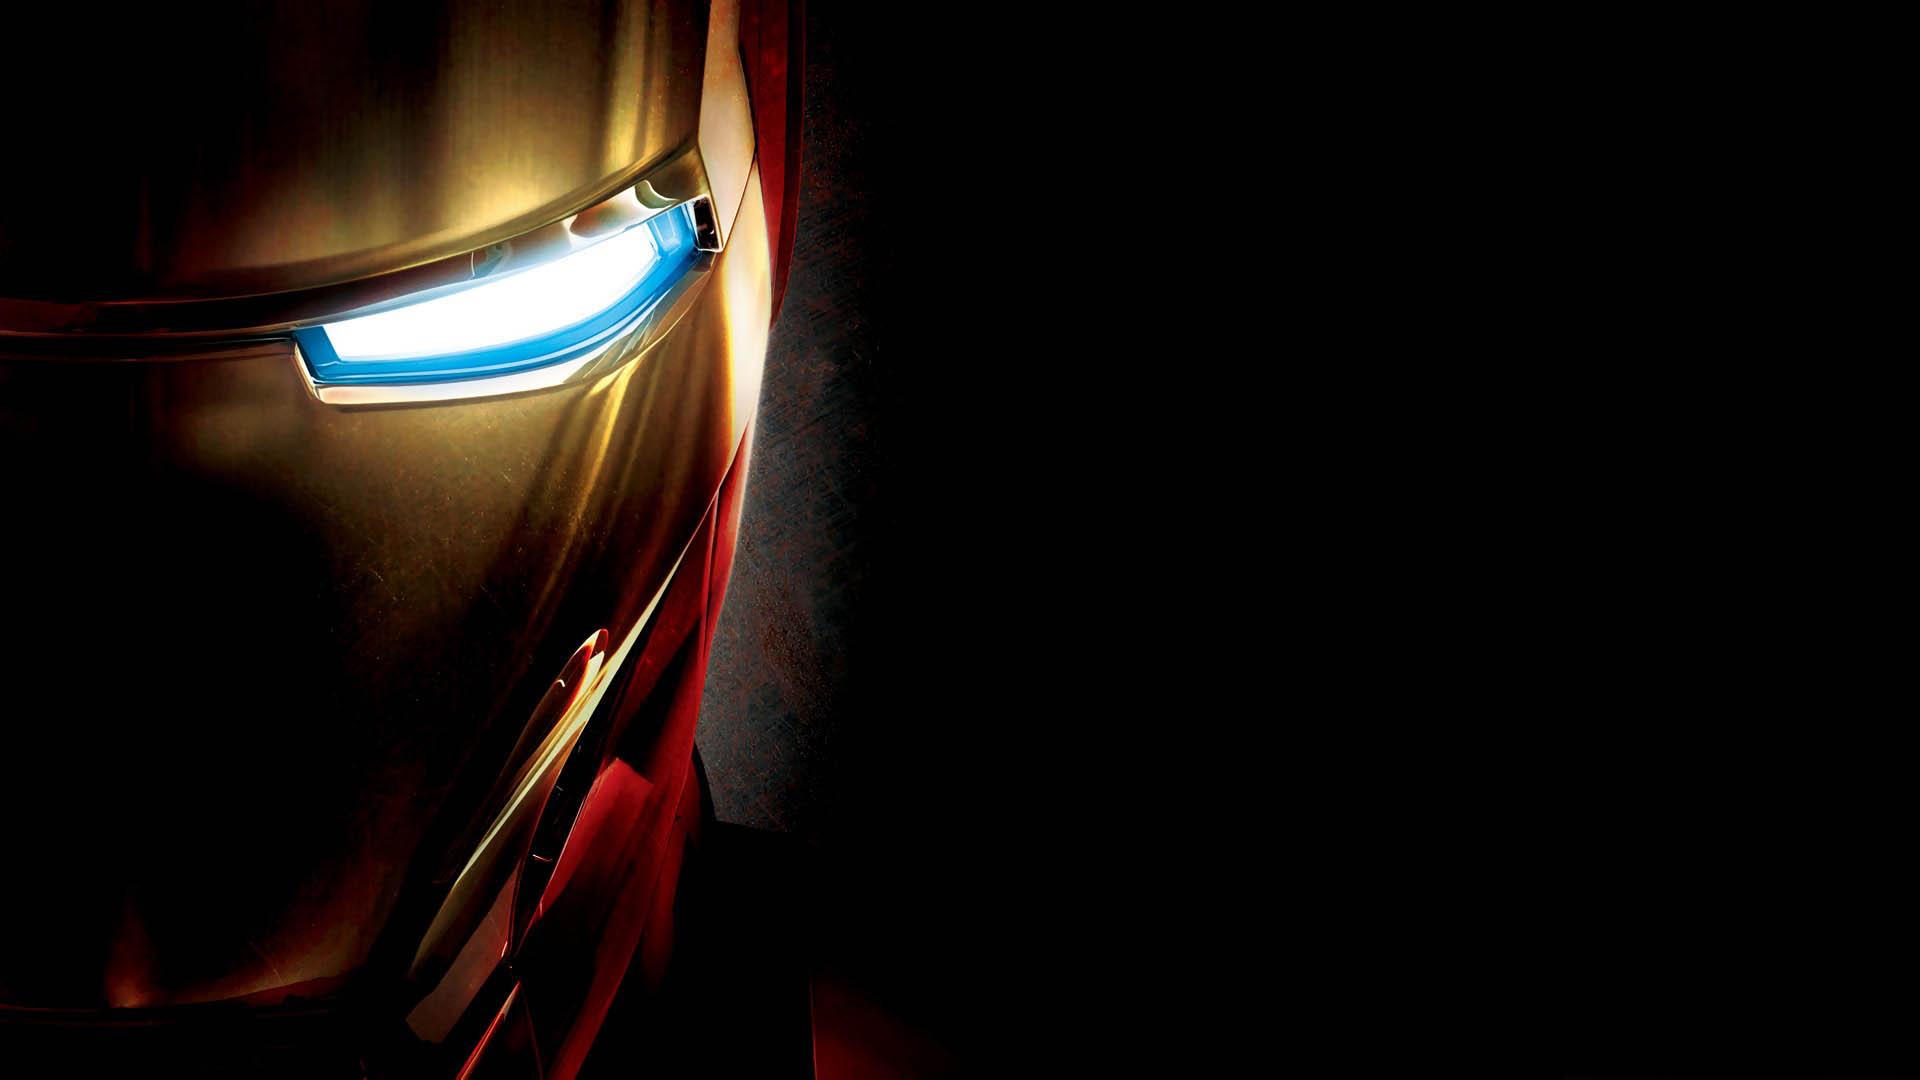 Iron Man 3 Wallpaper 1 1920x1080